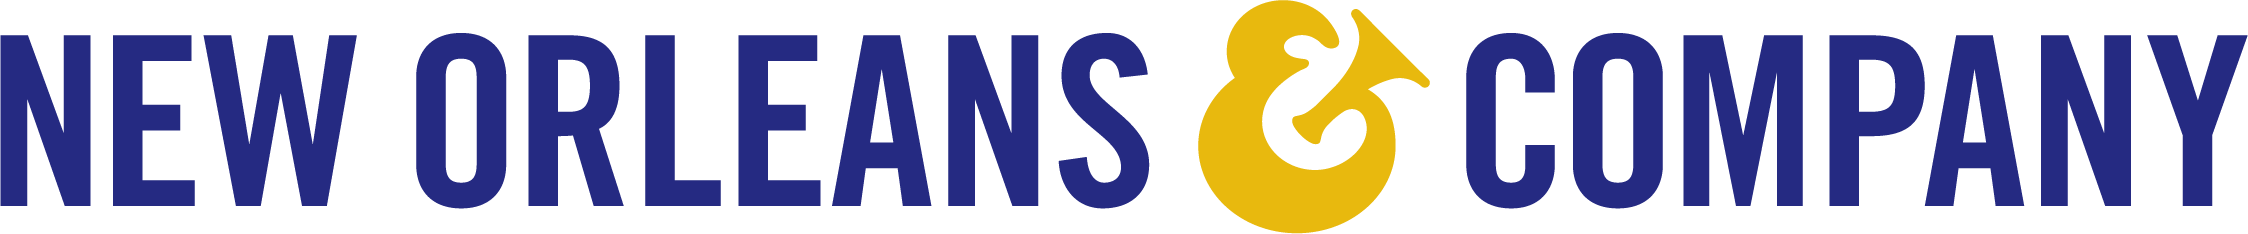 New_Orleans_Company_Horizontal_Logo_4Color_556fd53f-d9e7-4a23-a210-4e9166cae82e.png